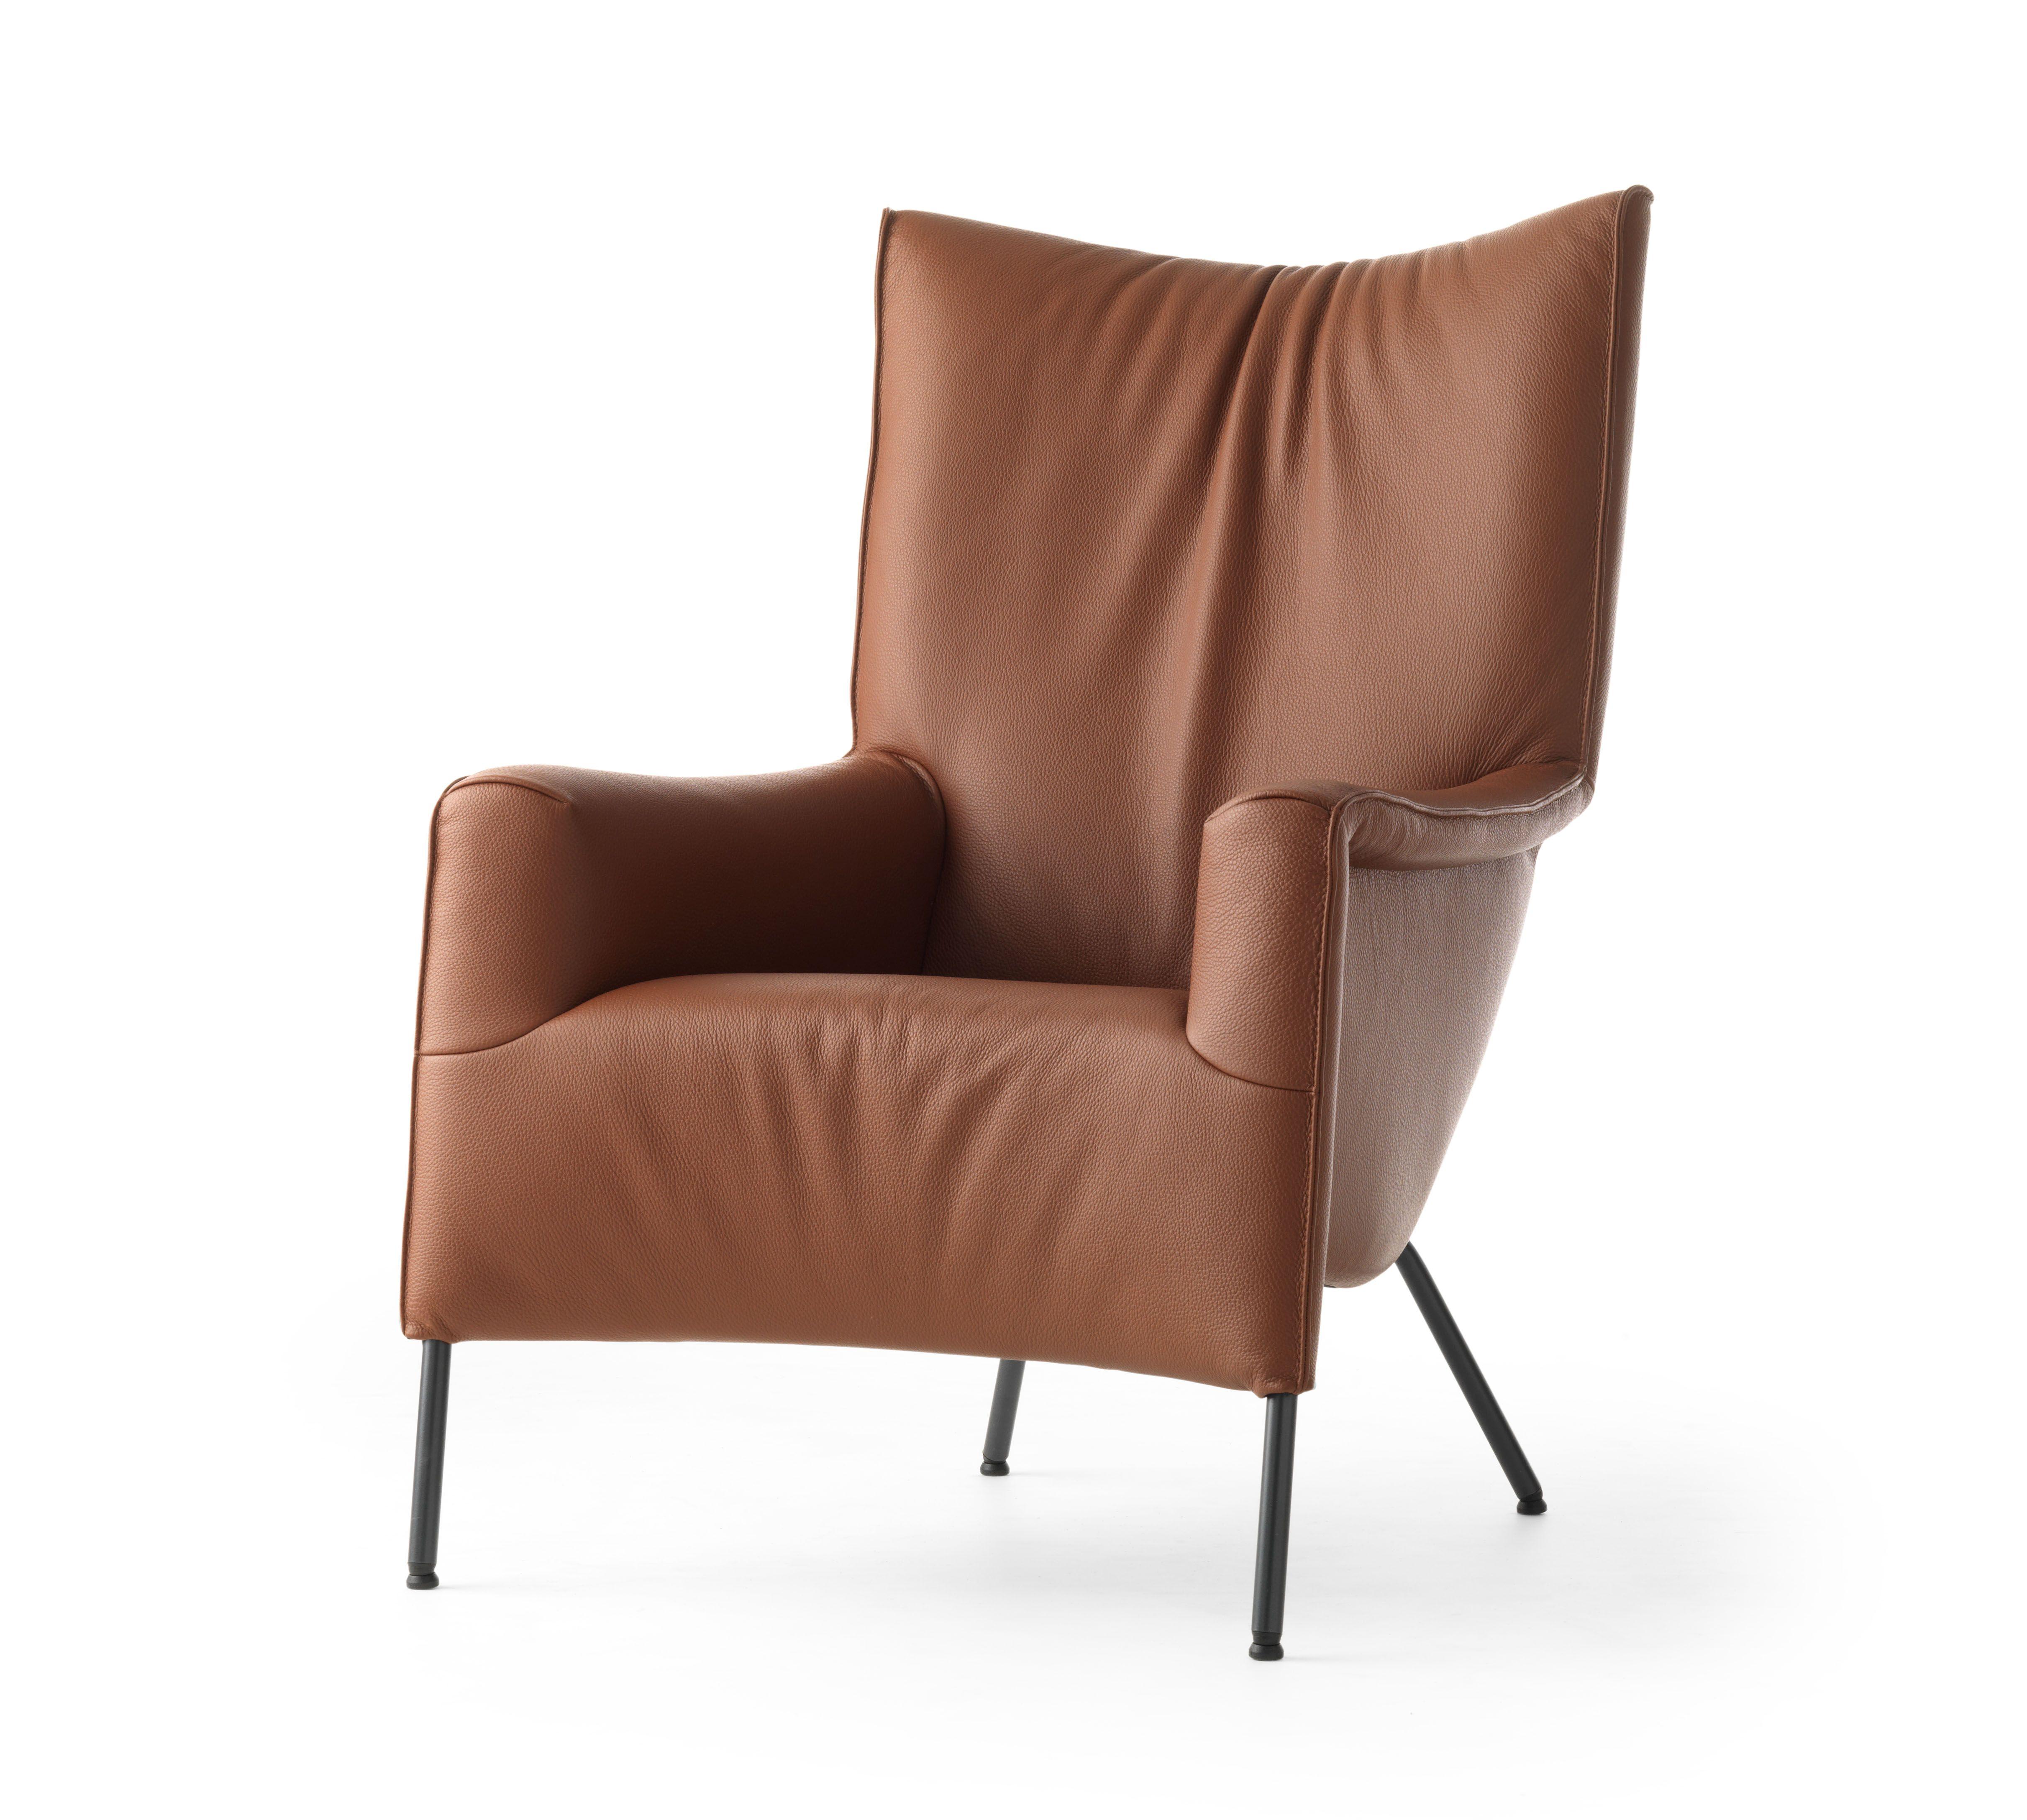 Roderick Vos Fauteuils.Pode Furniture Transit Two Armchair Design Roderick Vos